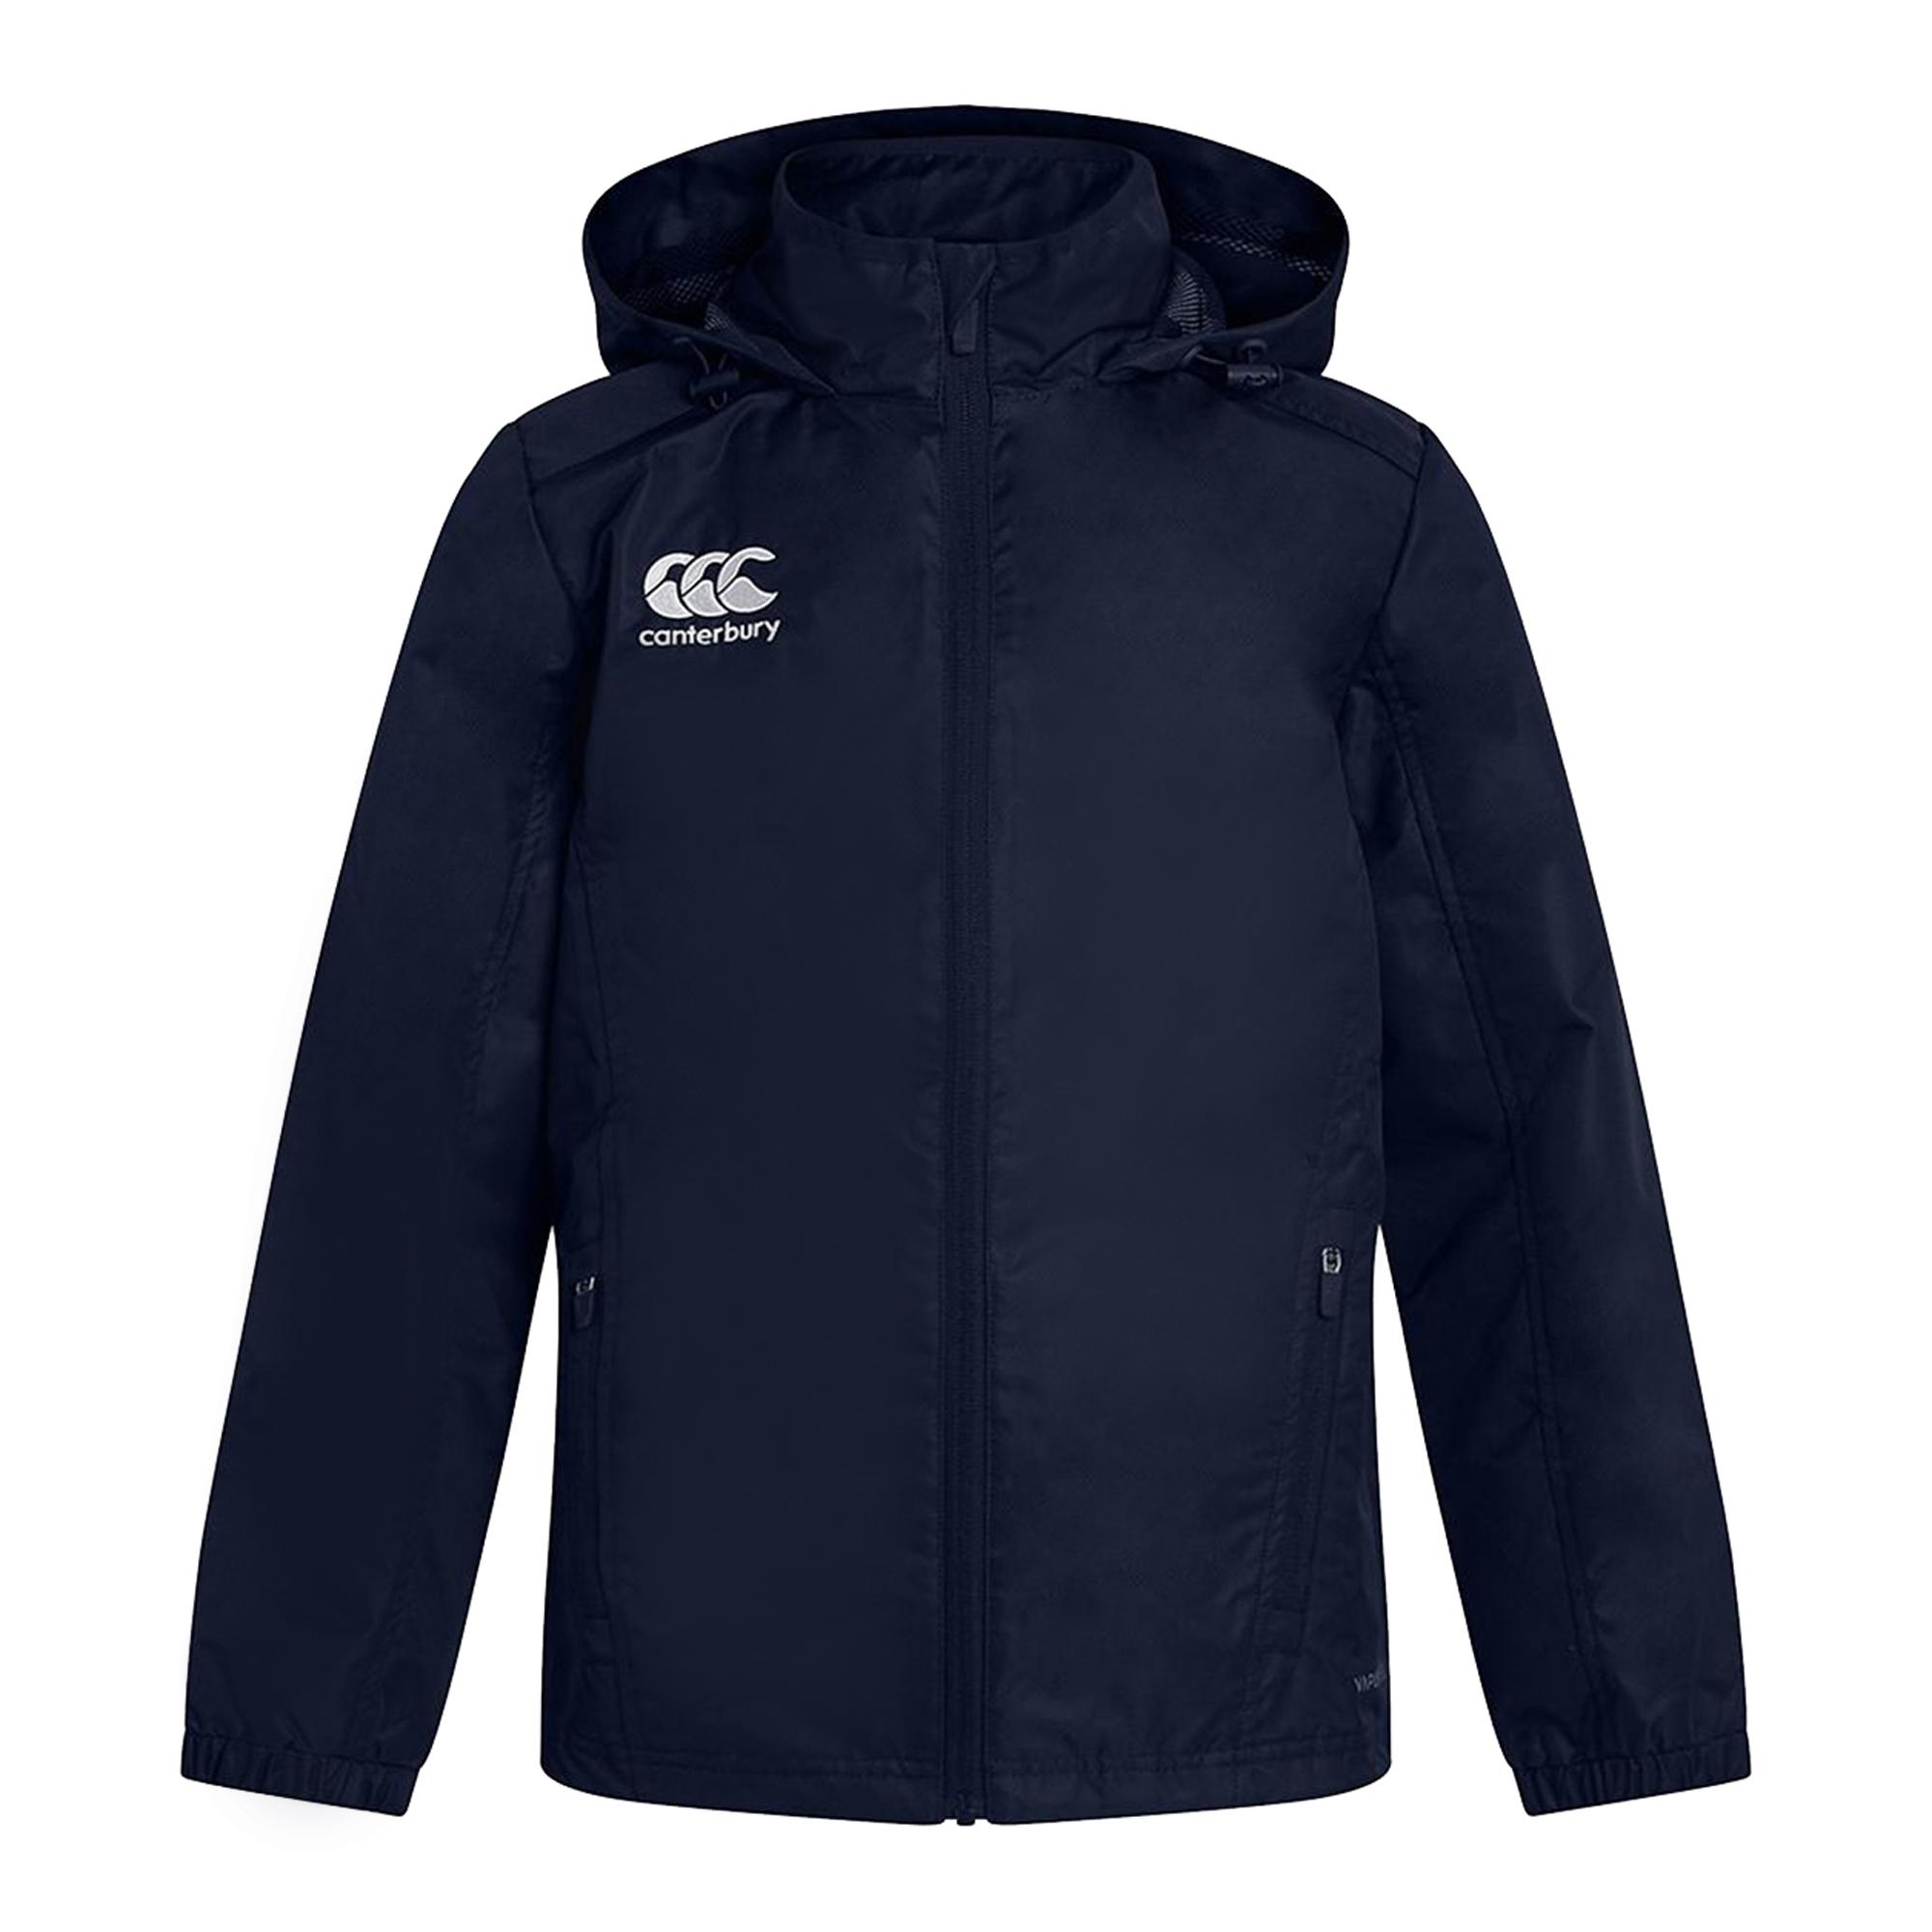 Canterbury Childrens/Kids Club Track Jacket (12 Years) (Black)